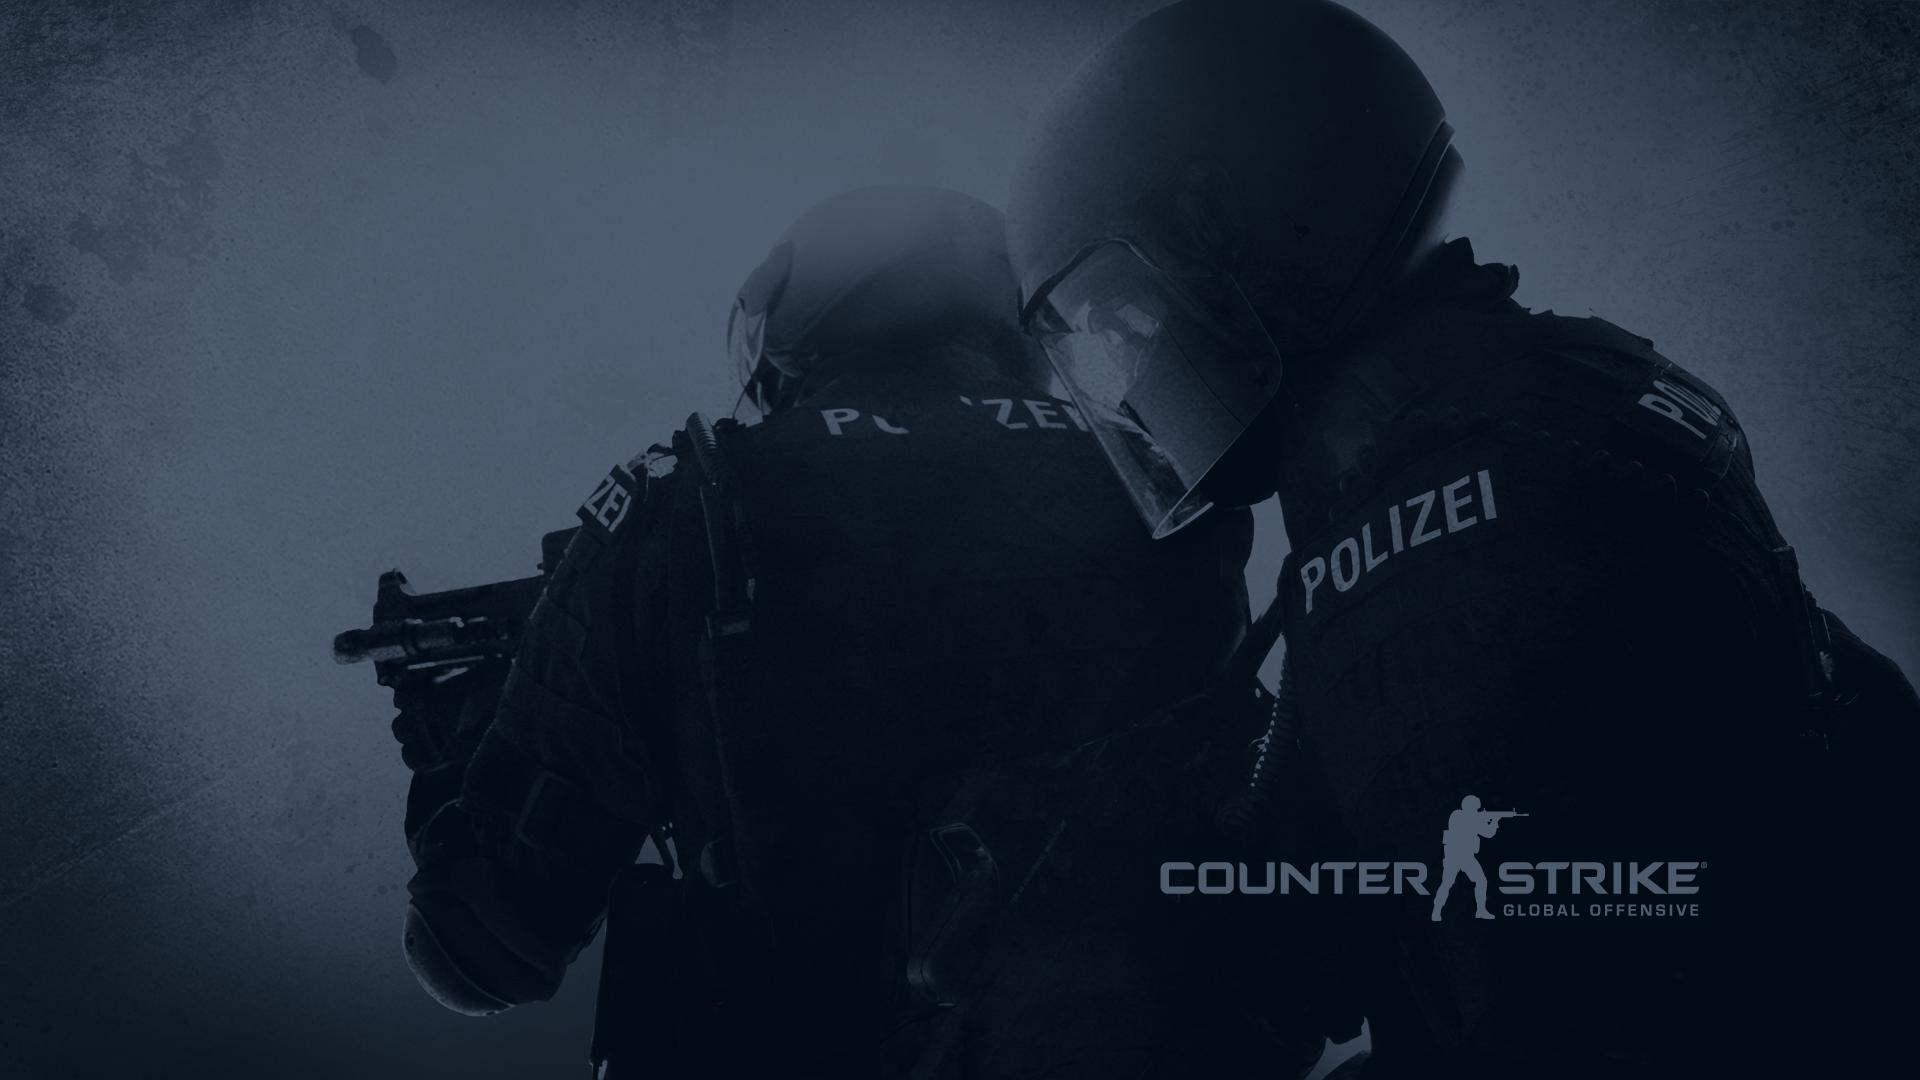 Counter Strike Wallpapers - Wallpaper Cave Counter Strike Wallpaper Hd